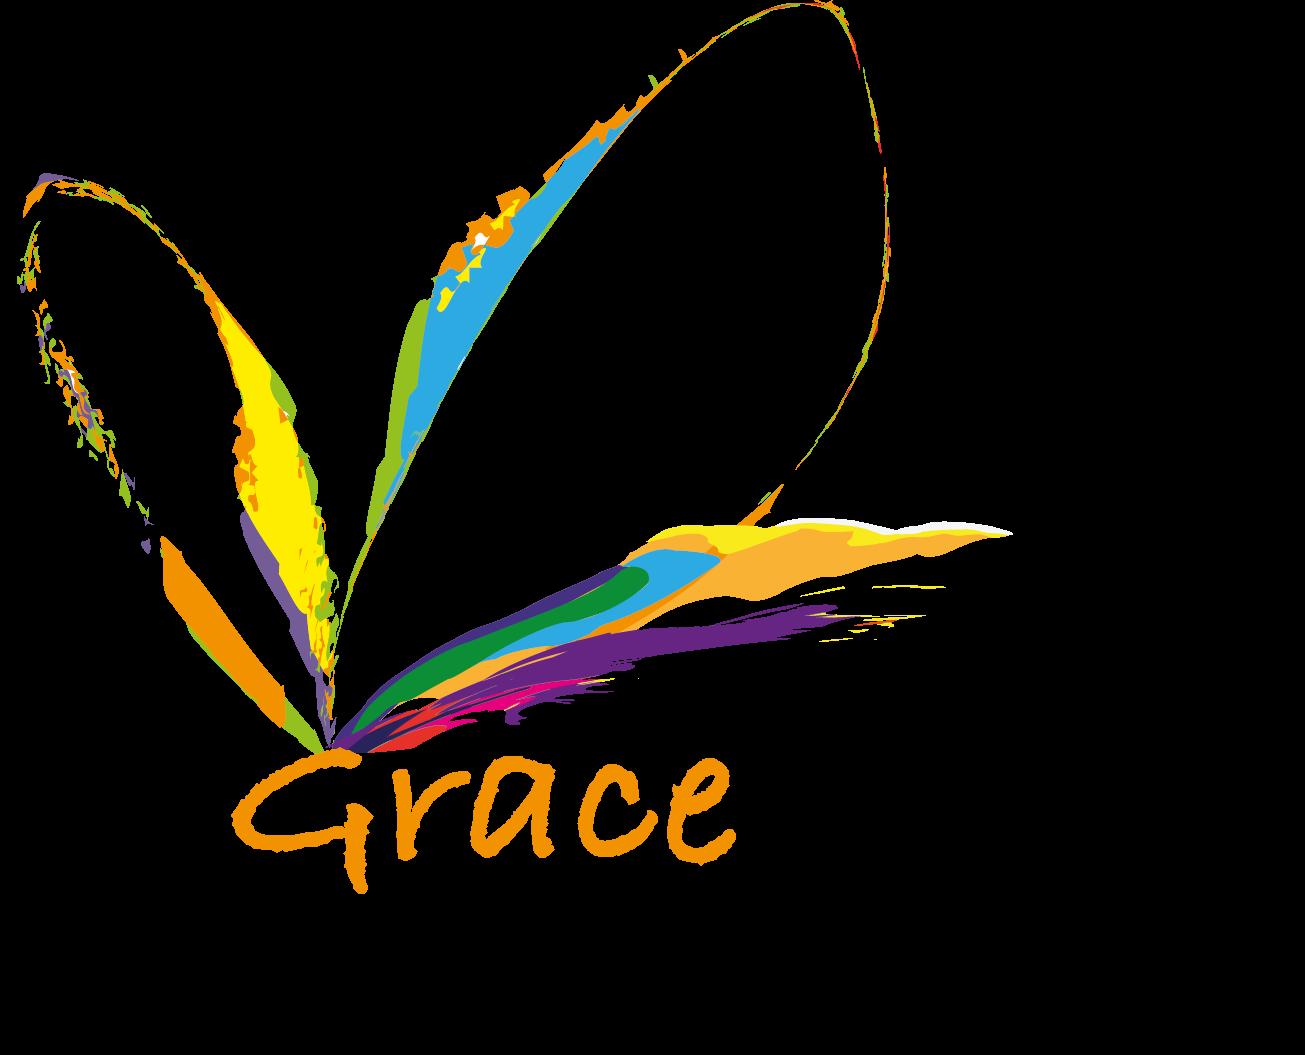 The Grace Institute of Awakening